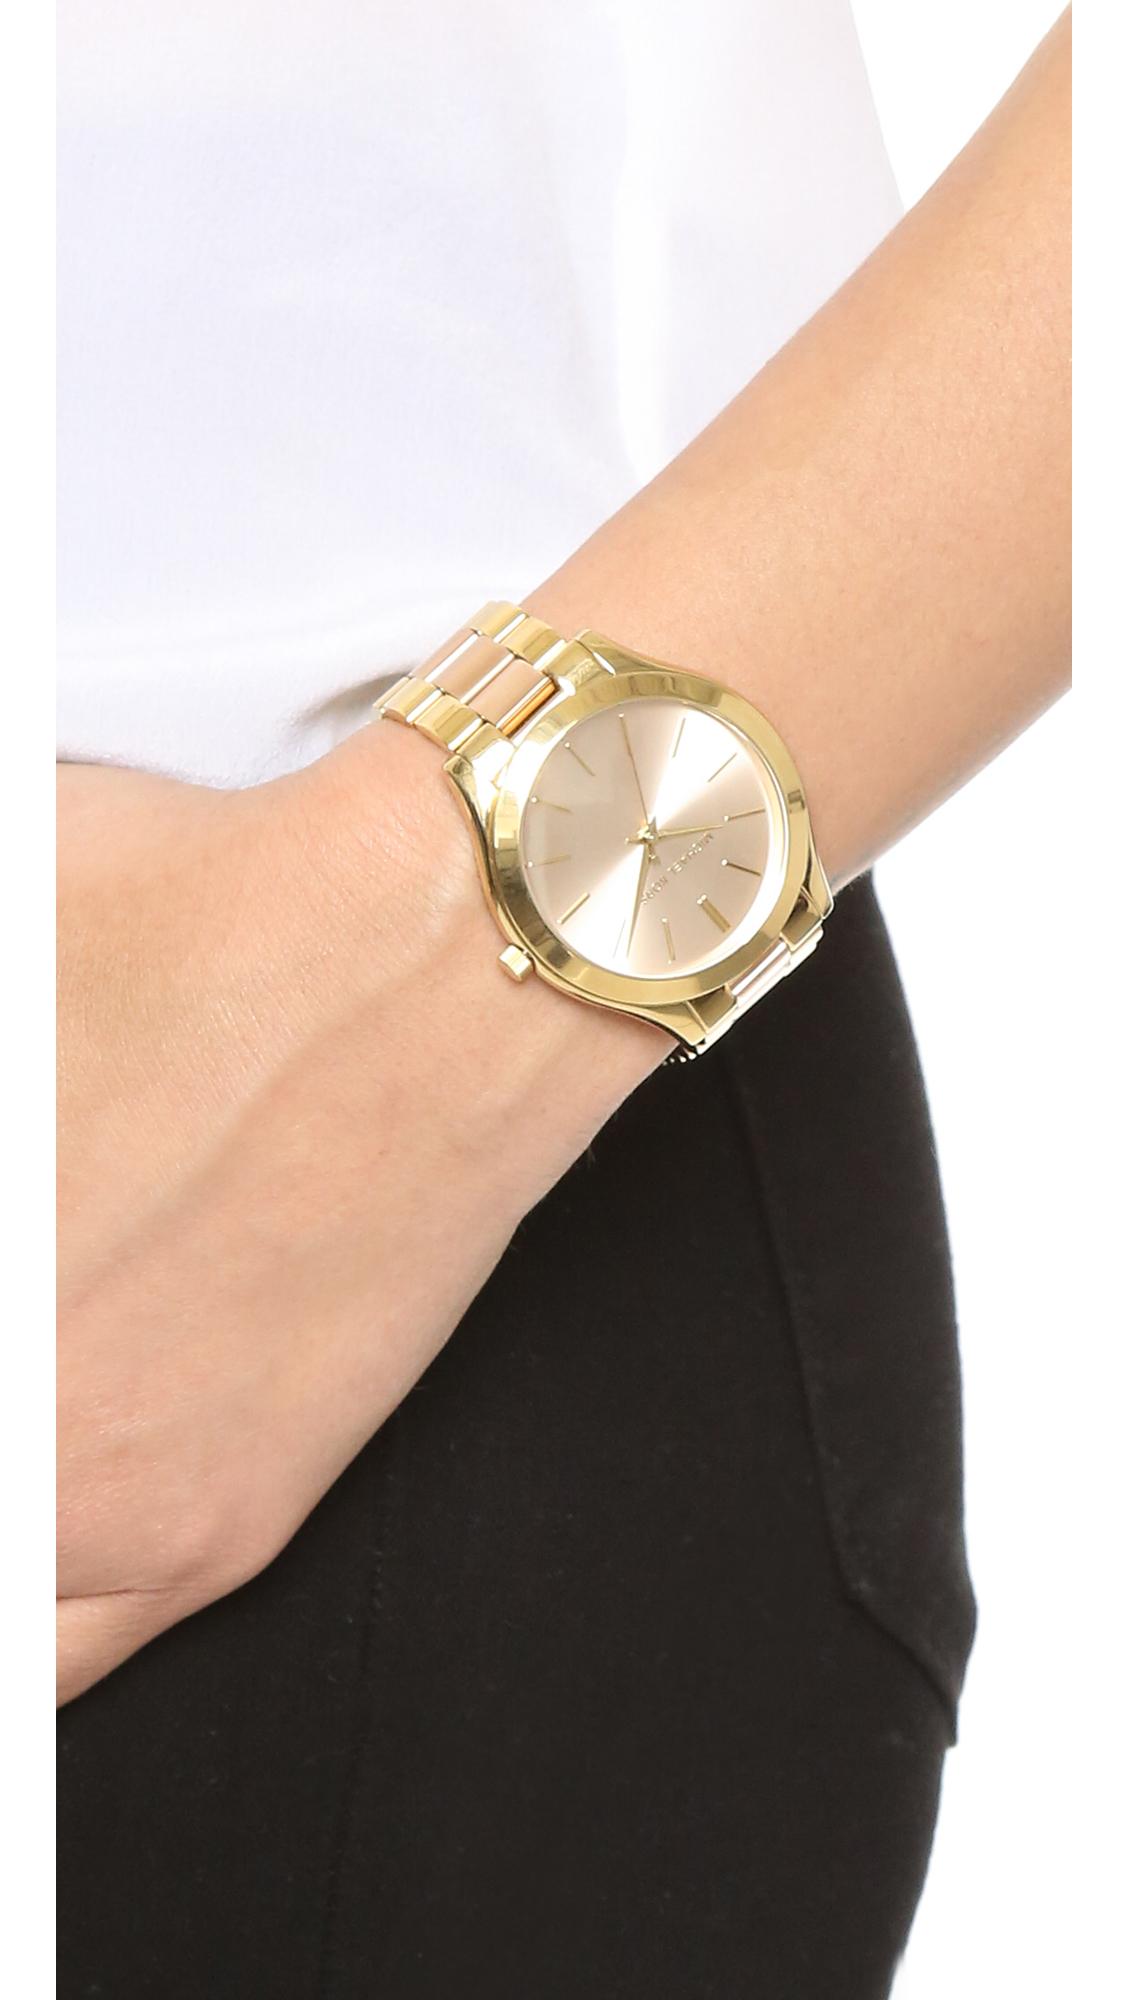 641e889793a4 Lyst - Michael Kors Slim Runway Watch in Metallic